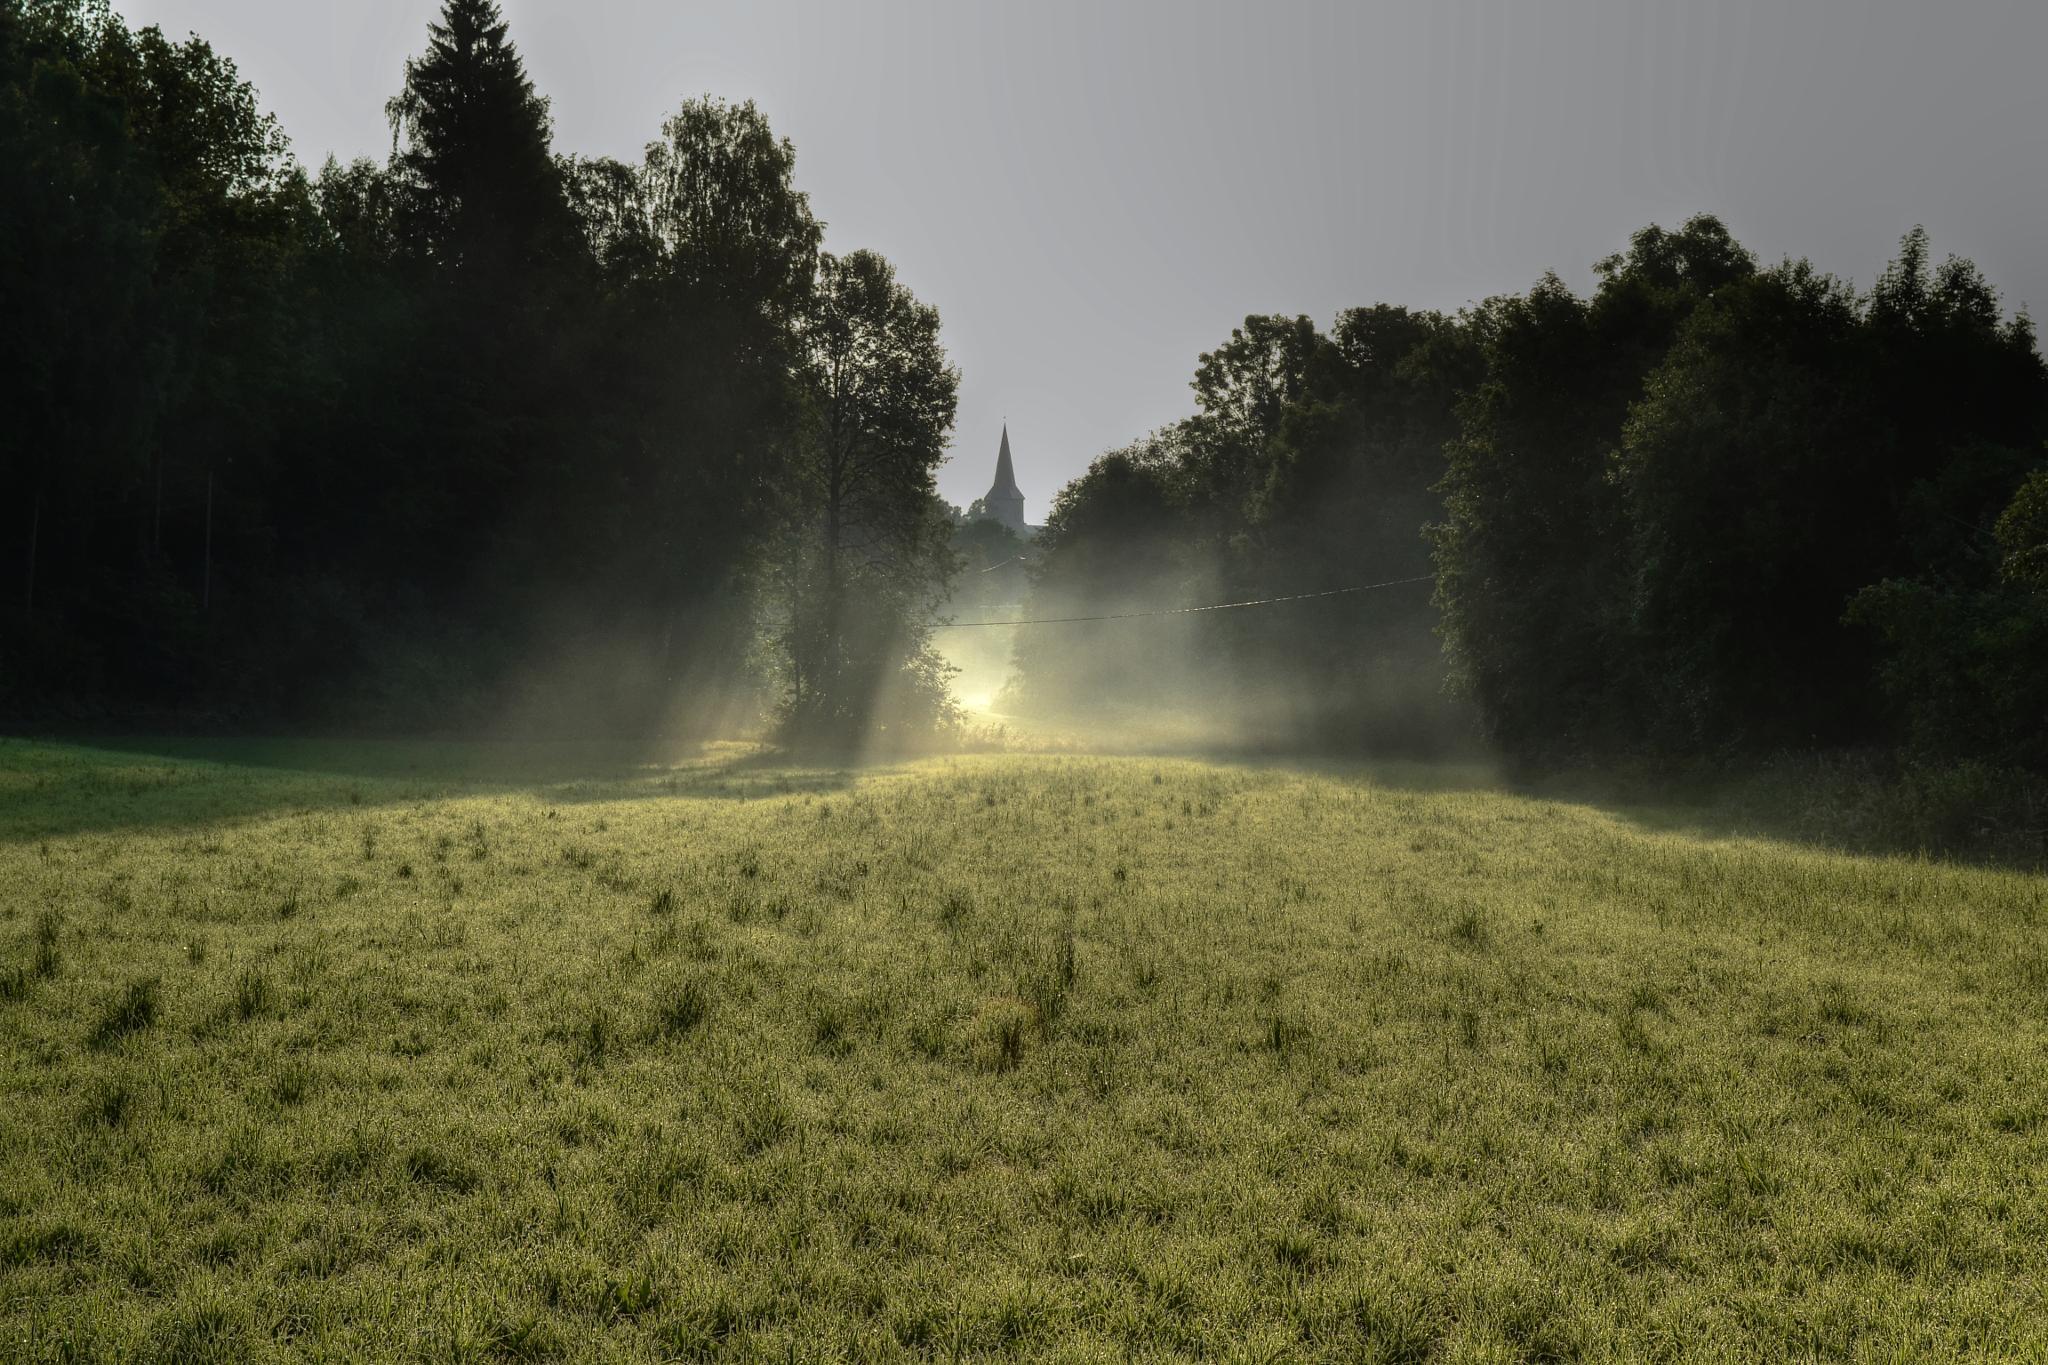 Morning fog. Asker church by Peer